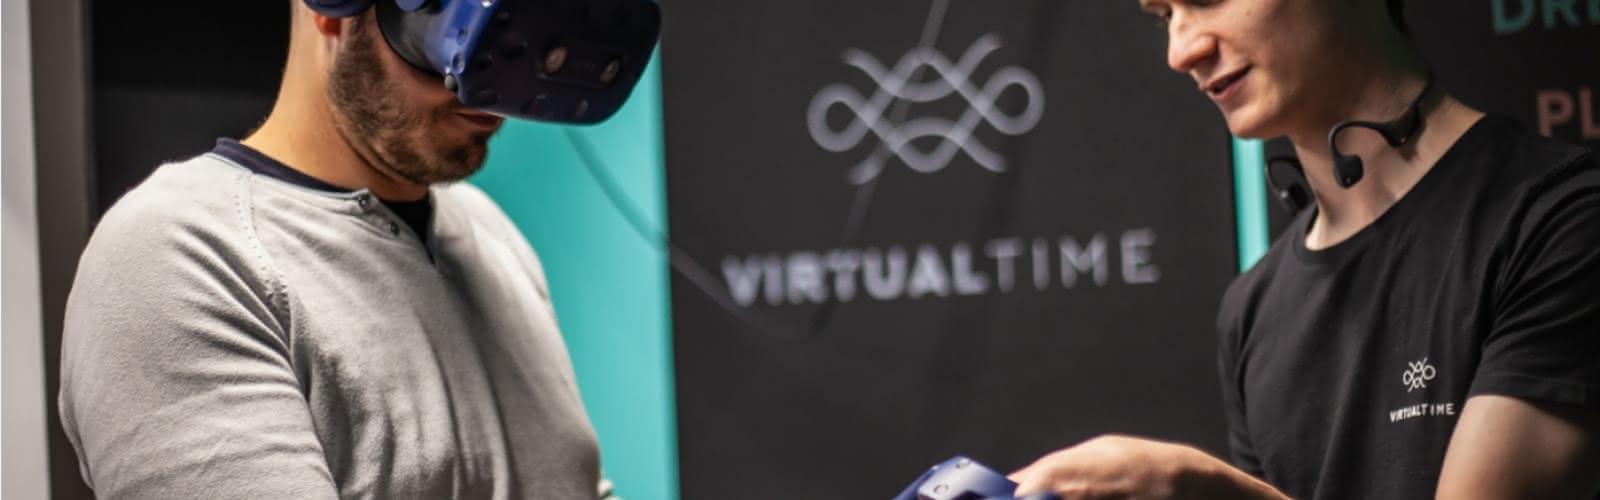 VirtualTime